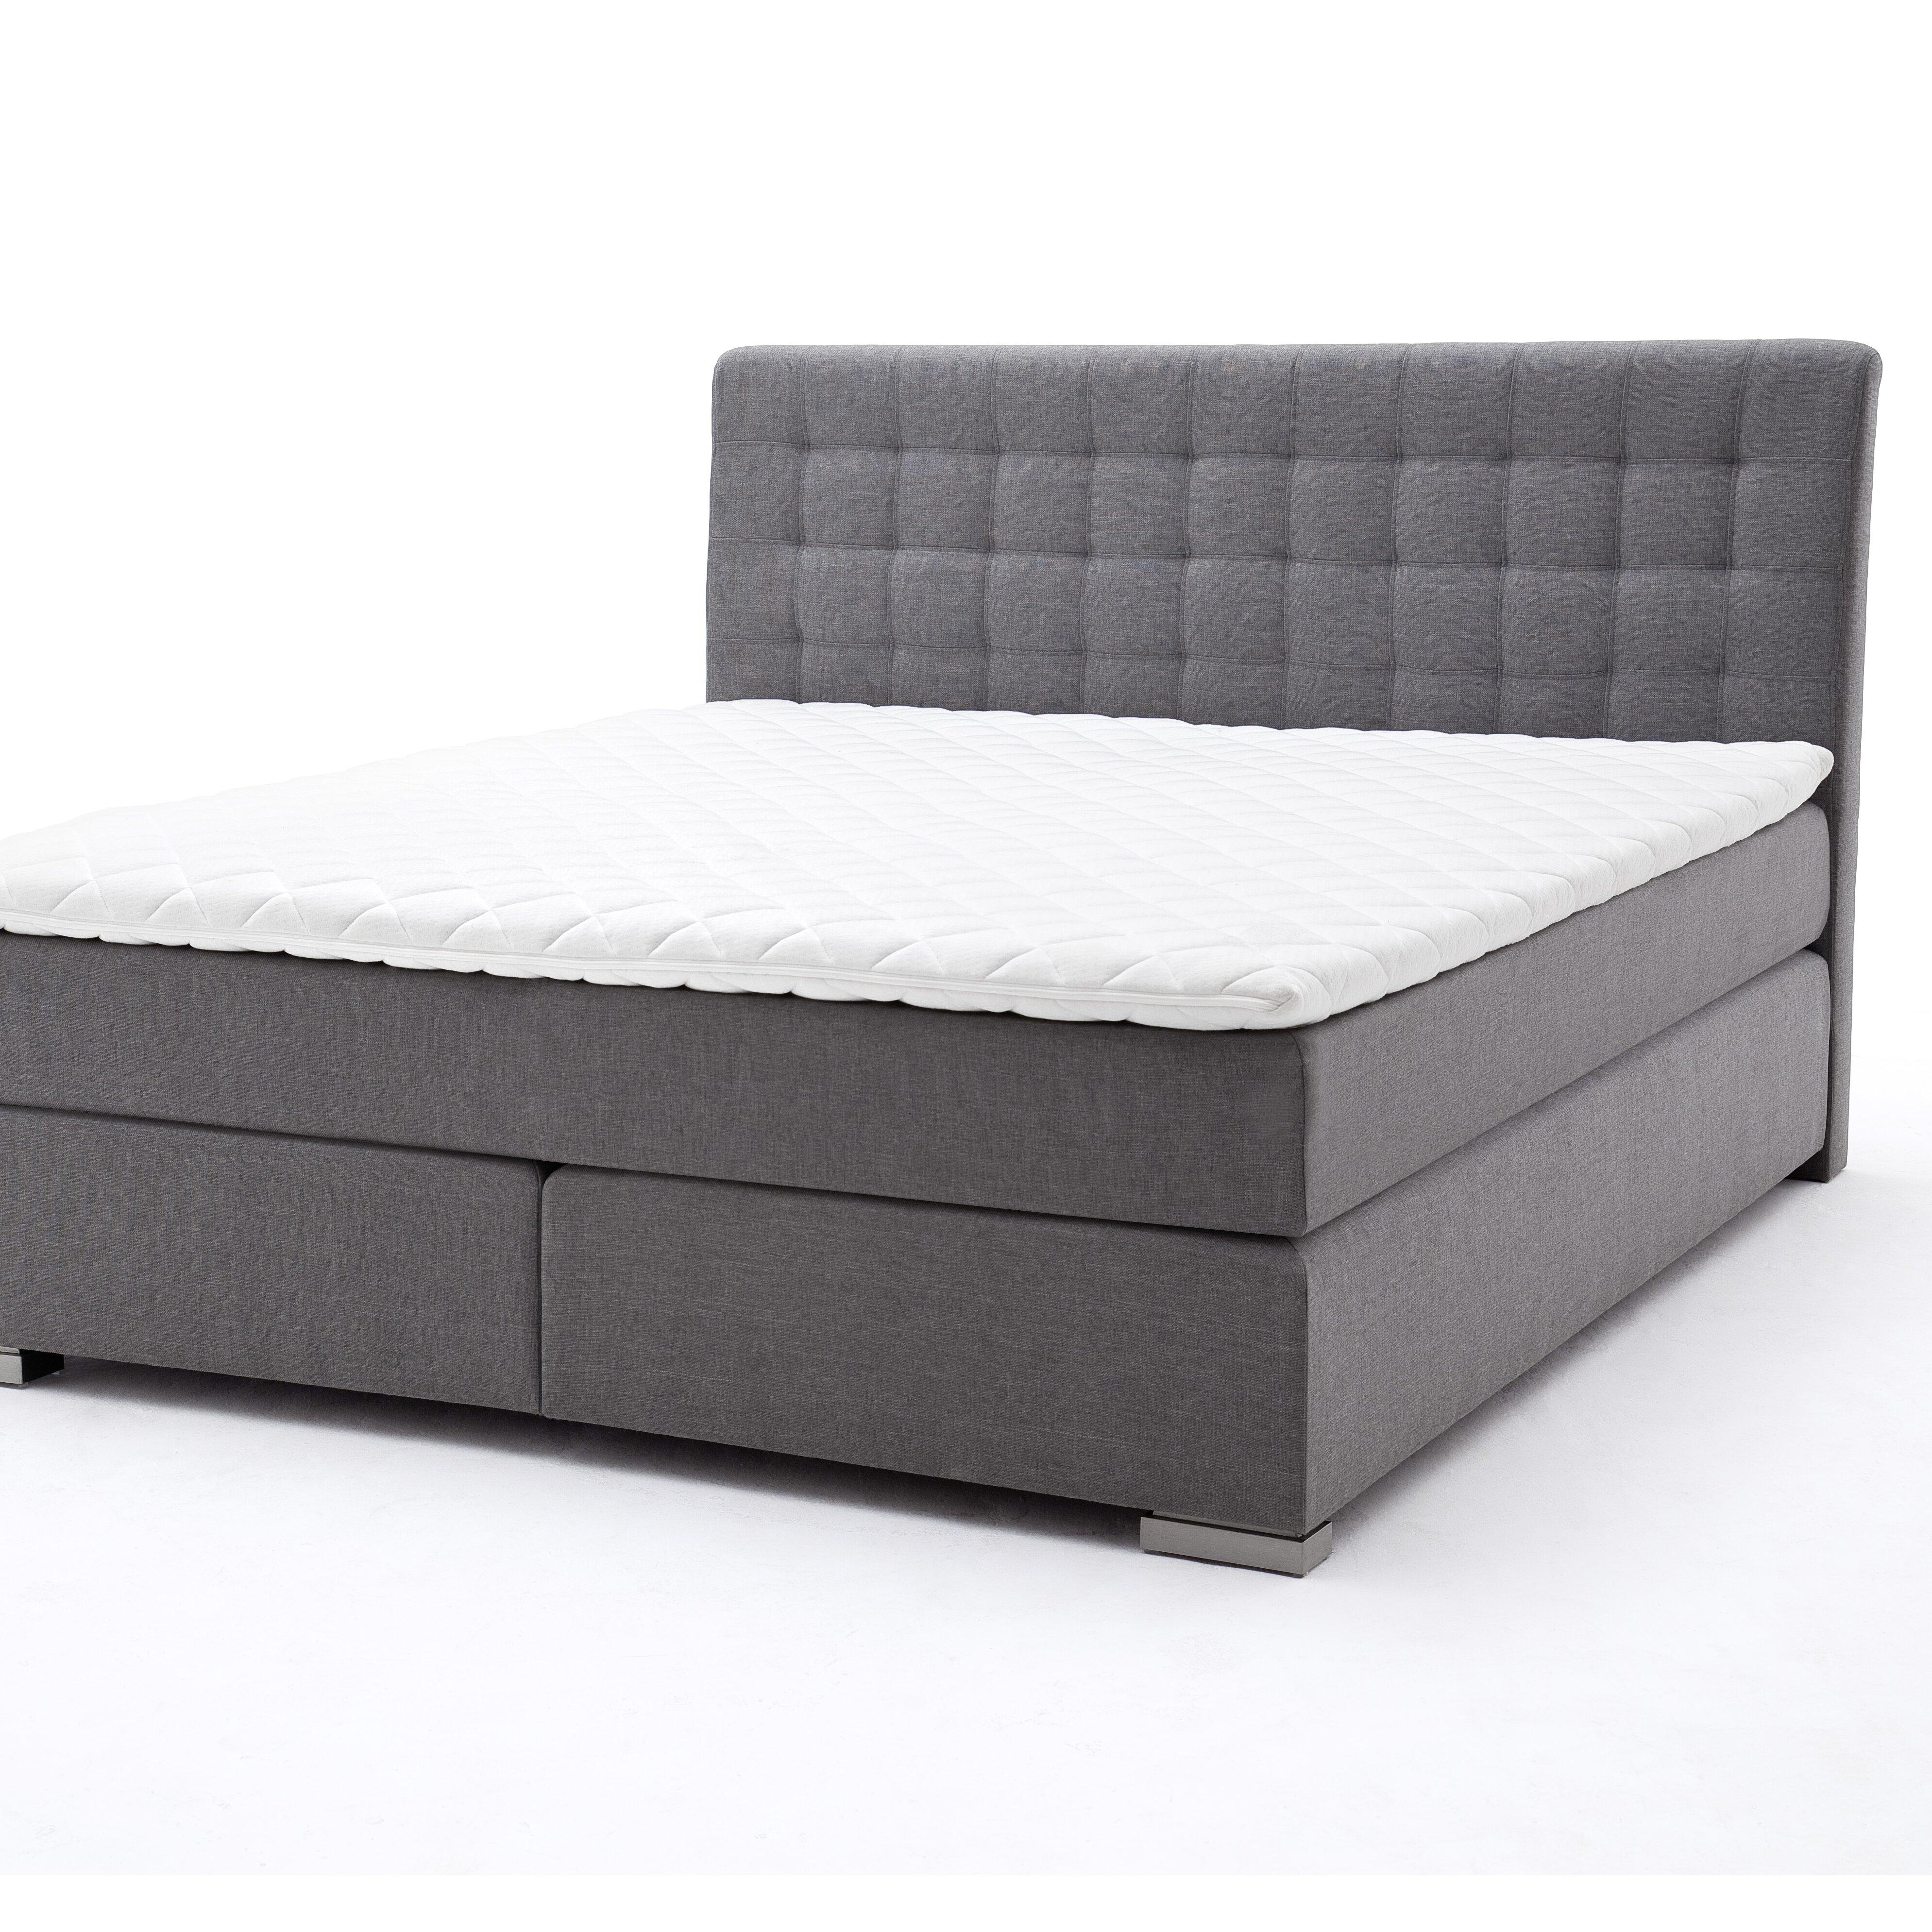 meise m bel boxspringbett lenno h rtegrad 2 3. Black Bedroom Furniture Sets. Home Design Ideas